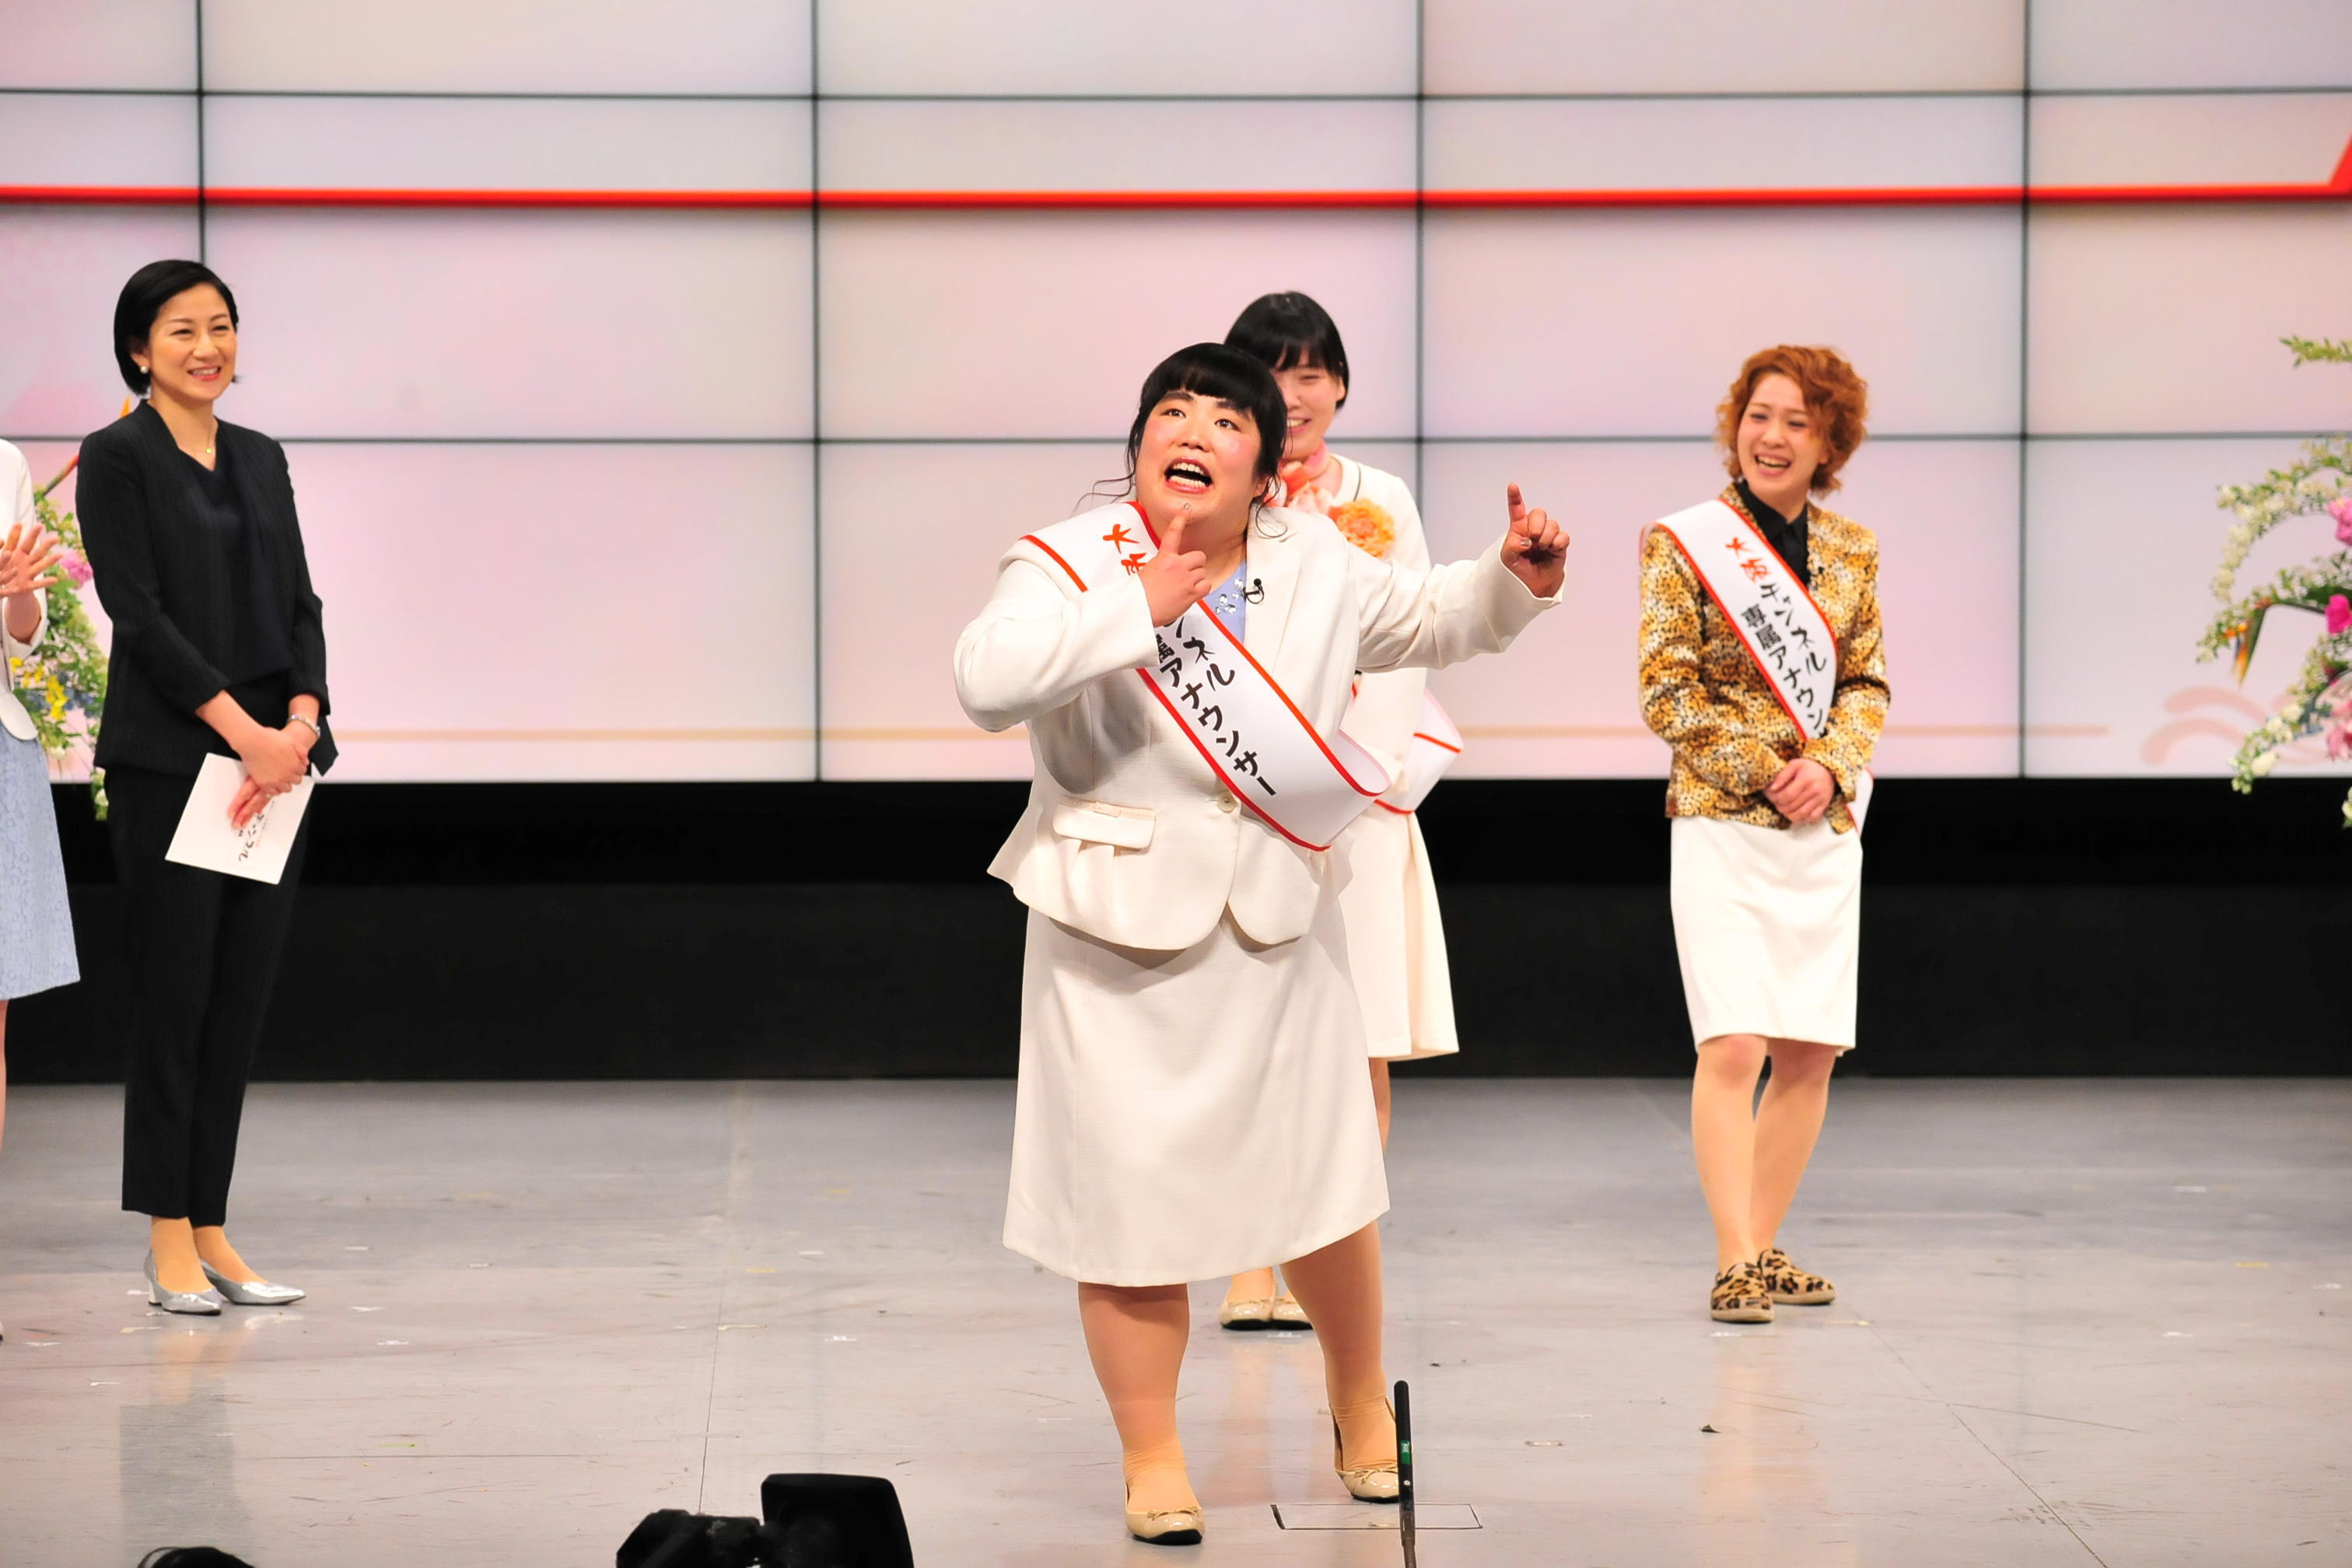 http://news.yoshimoto.co.jp/20170425161125-7c3430d466708a0e40e06254a52ae5ef18bd8825.jpg